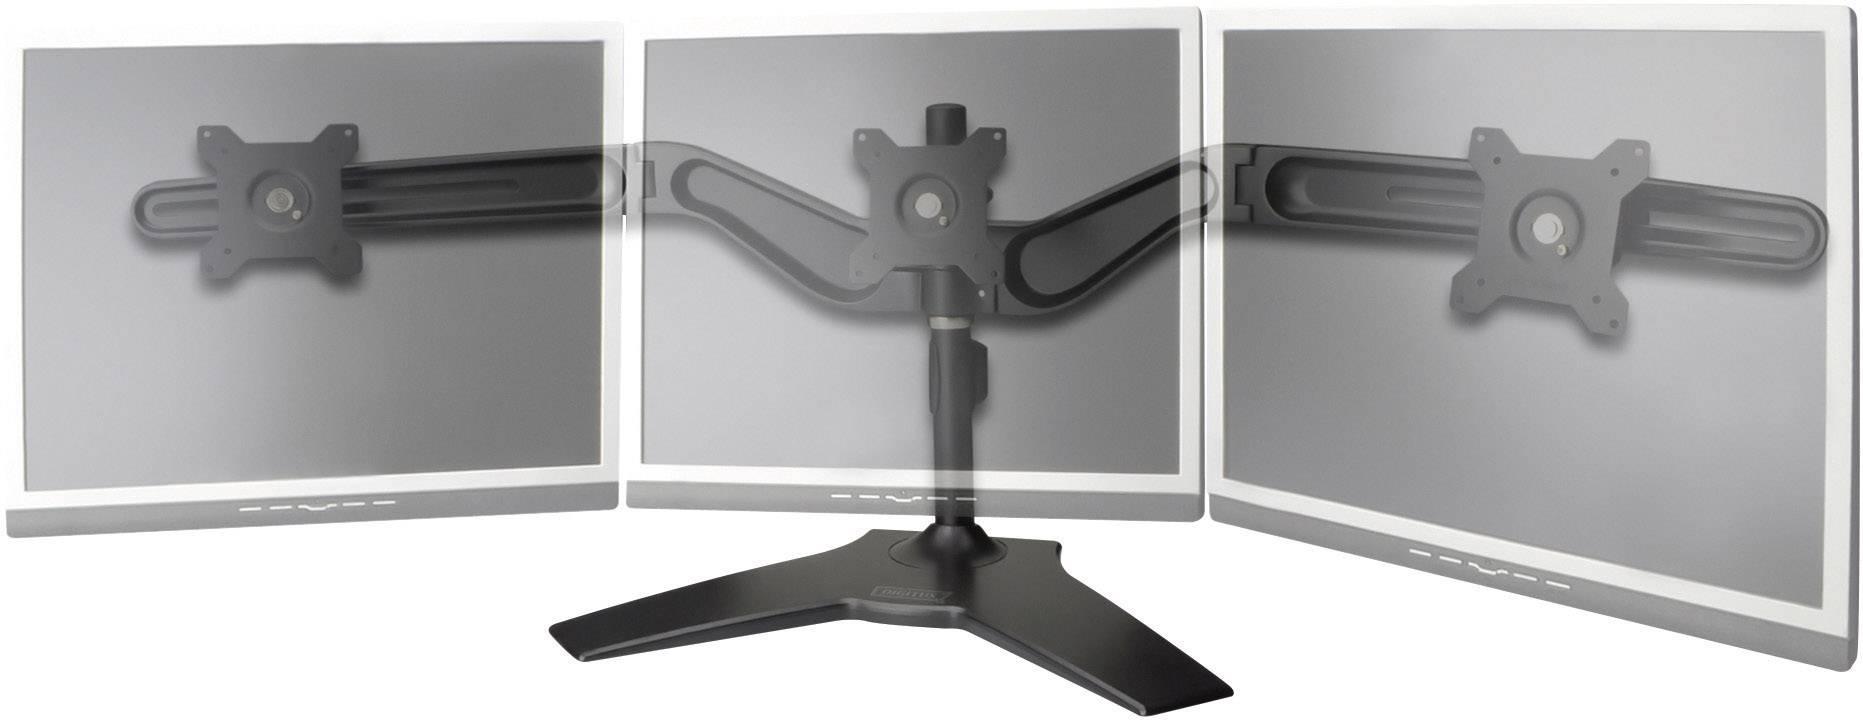 "Stojan na monitor Digitus DA-90315, 38,1 cm (15"") - 61,0 cm (24""), čierna"